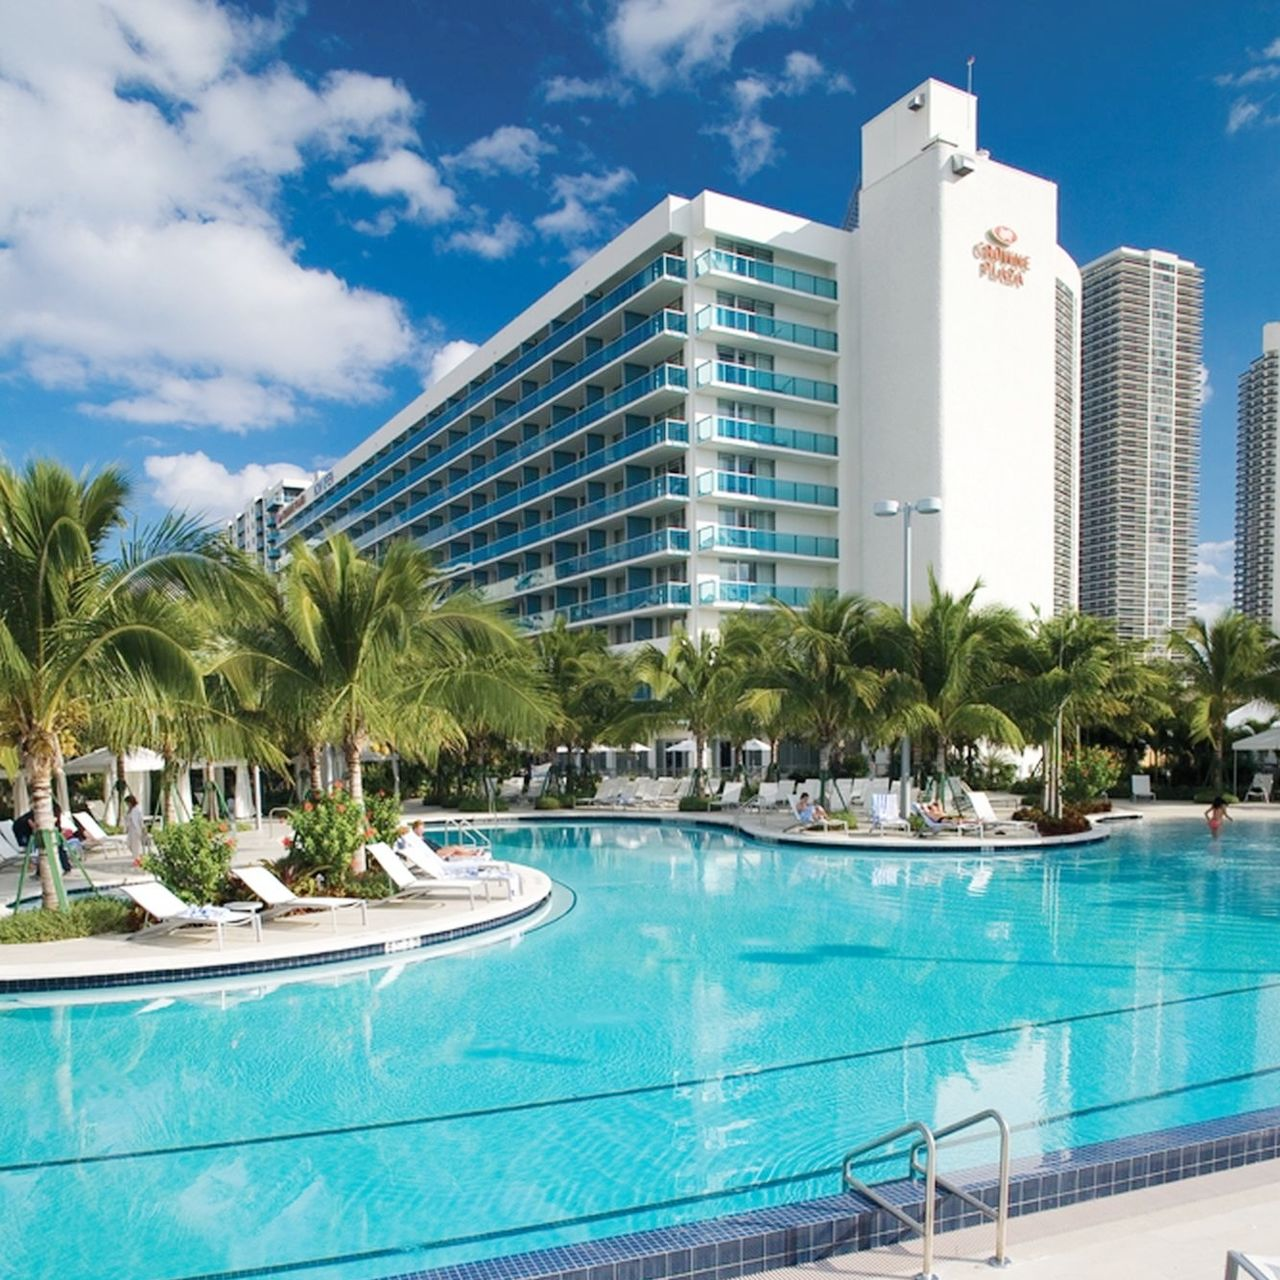 hotel florida hollywood beach crowne plaza canusa. Black Bedroom Furniture Sets. Home Design Ideas